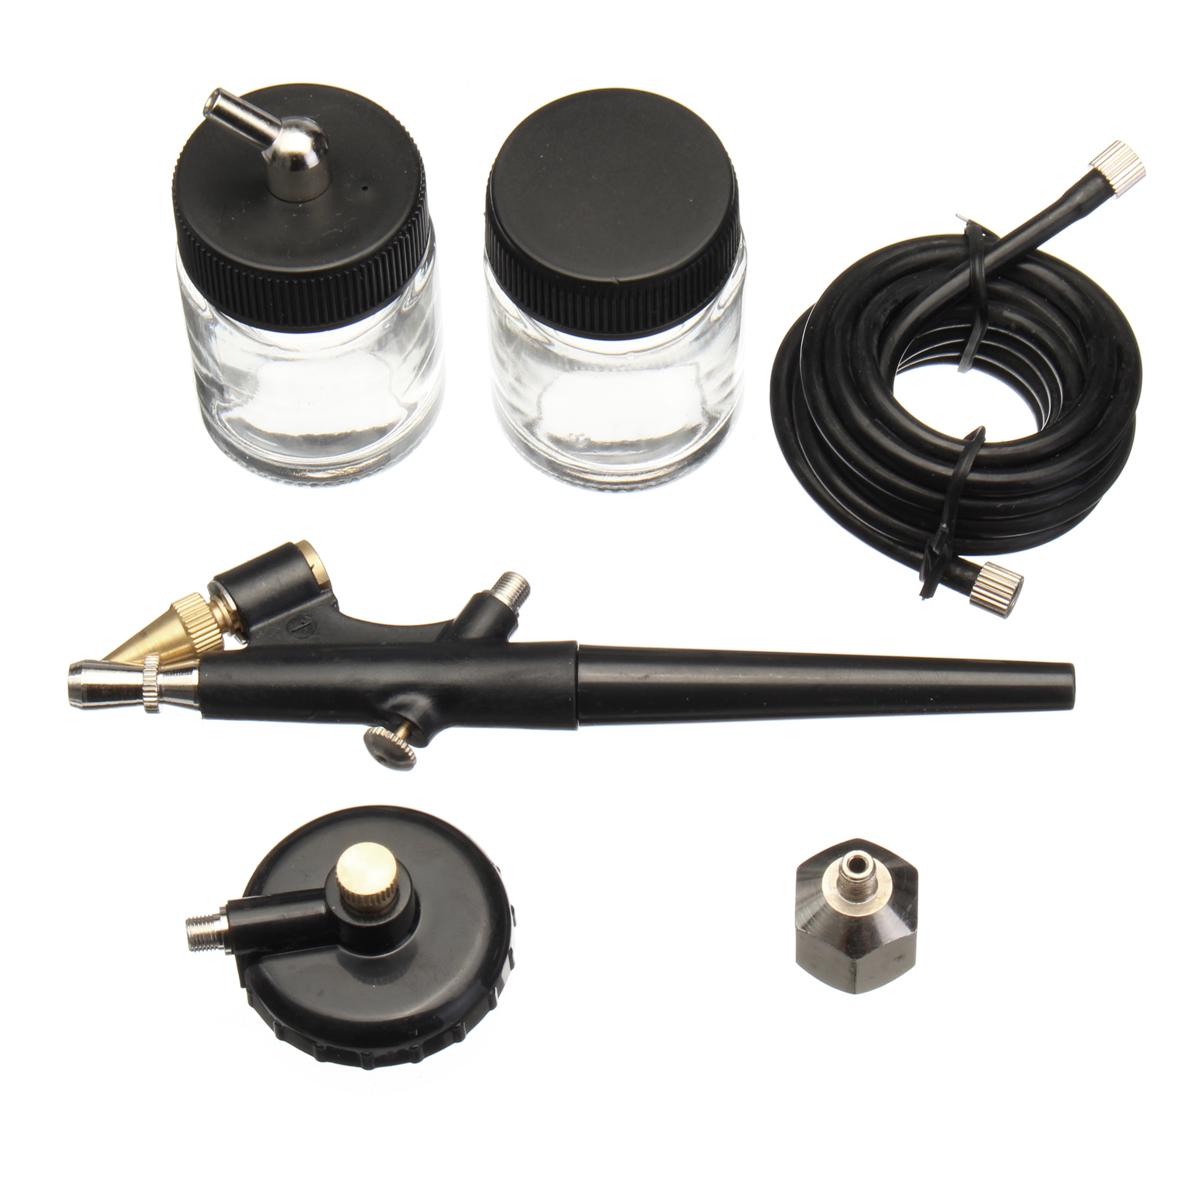 Mini Airbrush Spray Kit 22cc Ink Cup Hose Airbrush Paint Art Tool Kit Painter